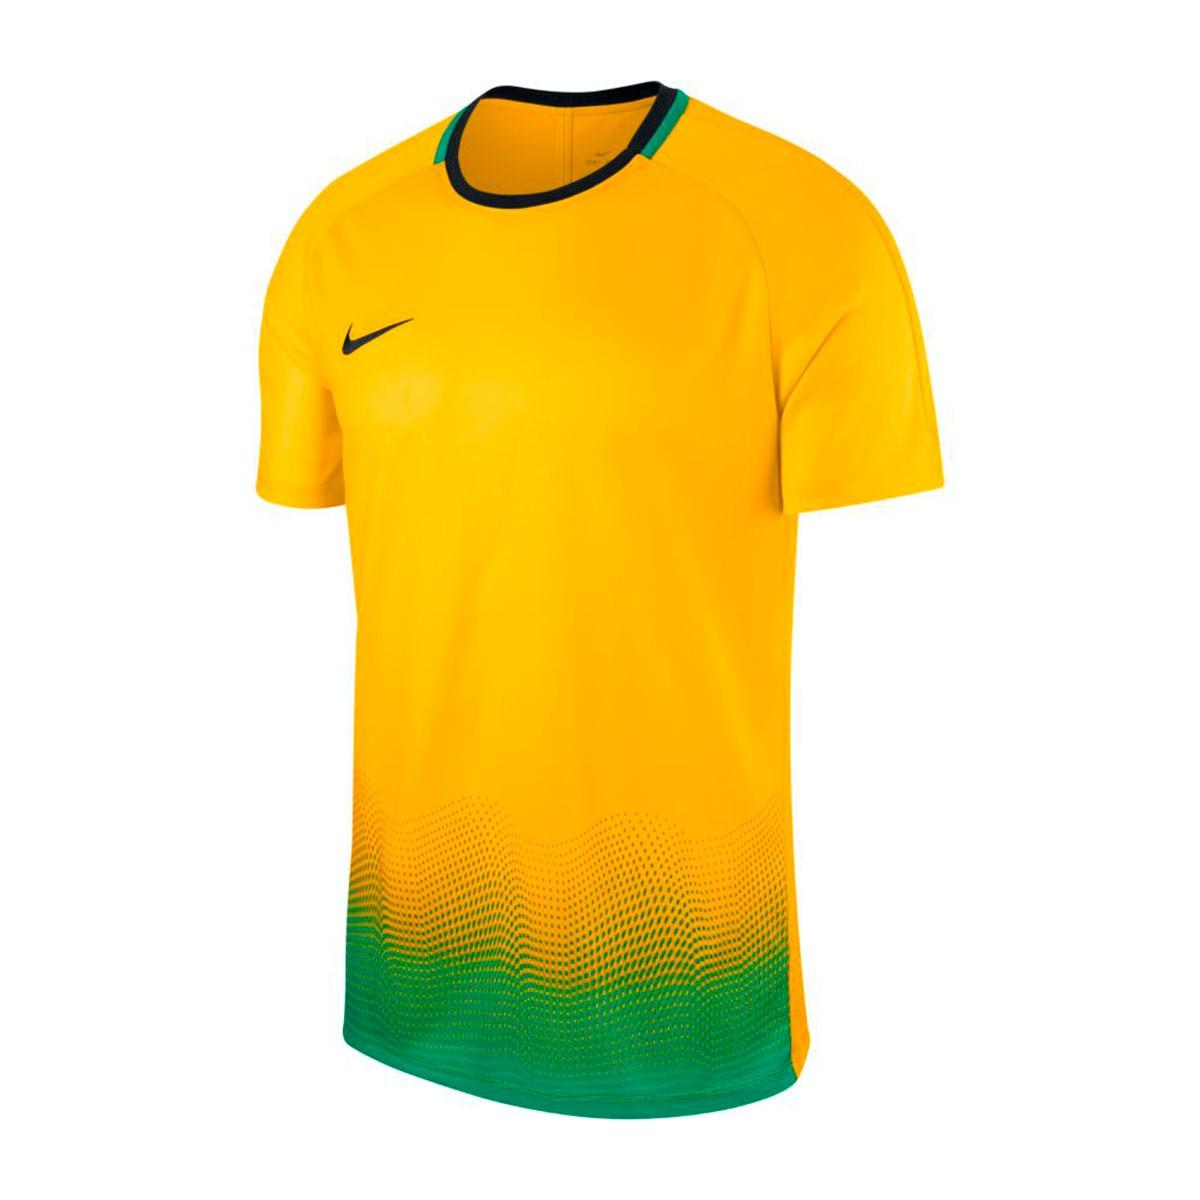 3276b82d Playera Nike Dry Academy GX Yellow-Lucky green-Black - Tienda de fútbol  Fútbol Emotion